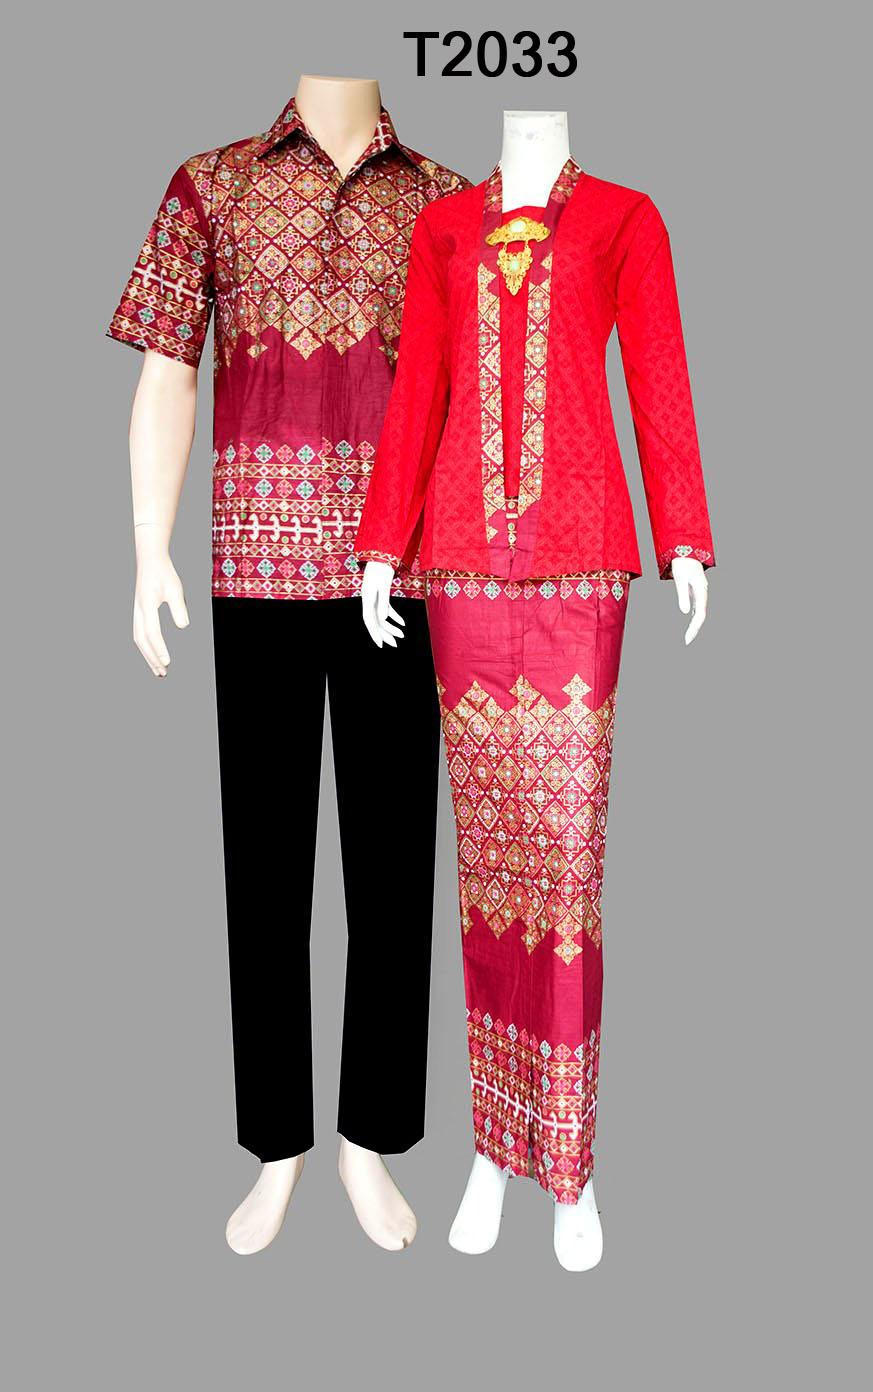 Baju Batik Couple Model Kebaya Rok Span T2033